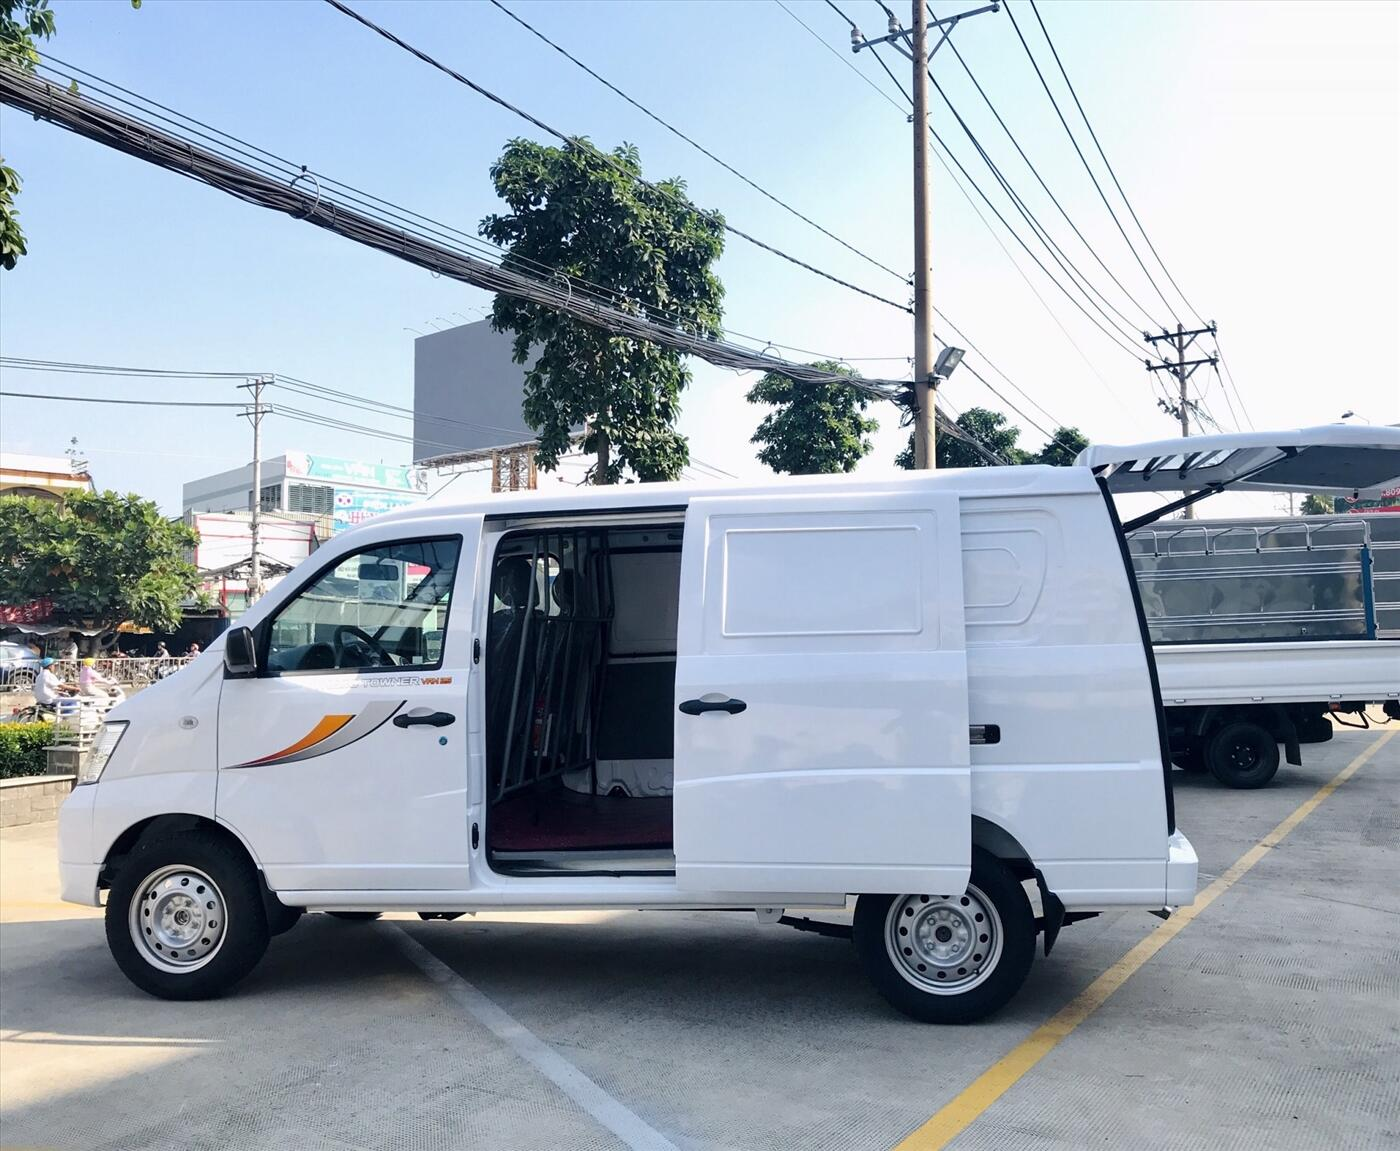 Xe tải Thaco Towner Van 2S - Tải trọng 945kg